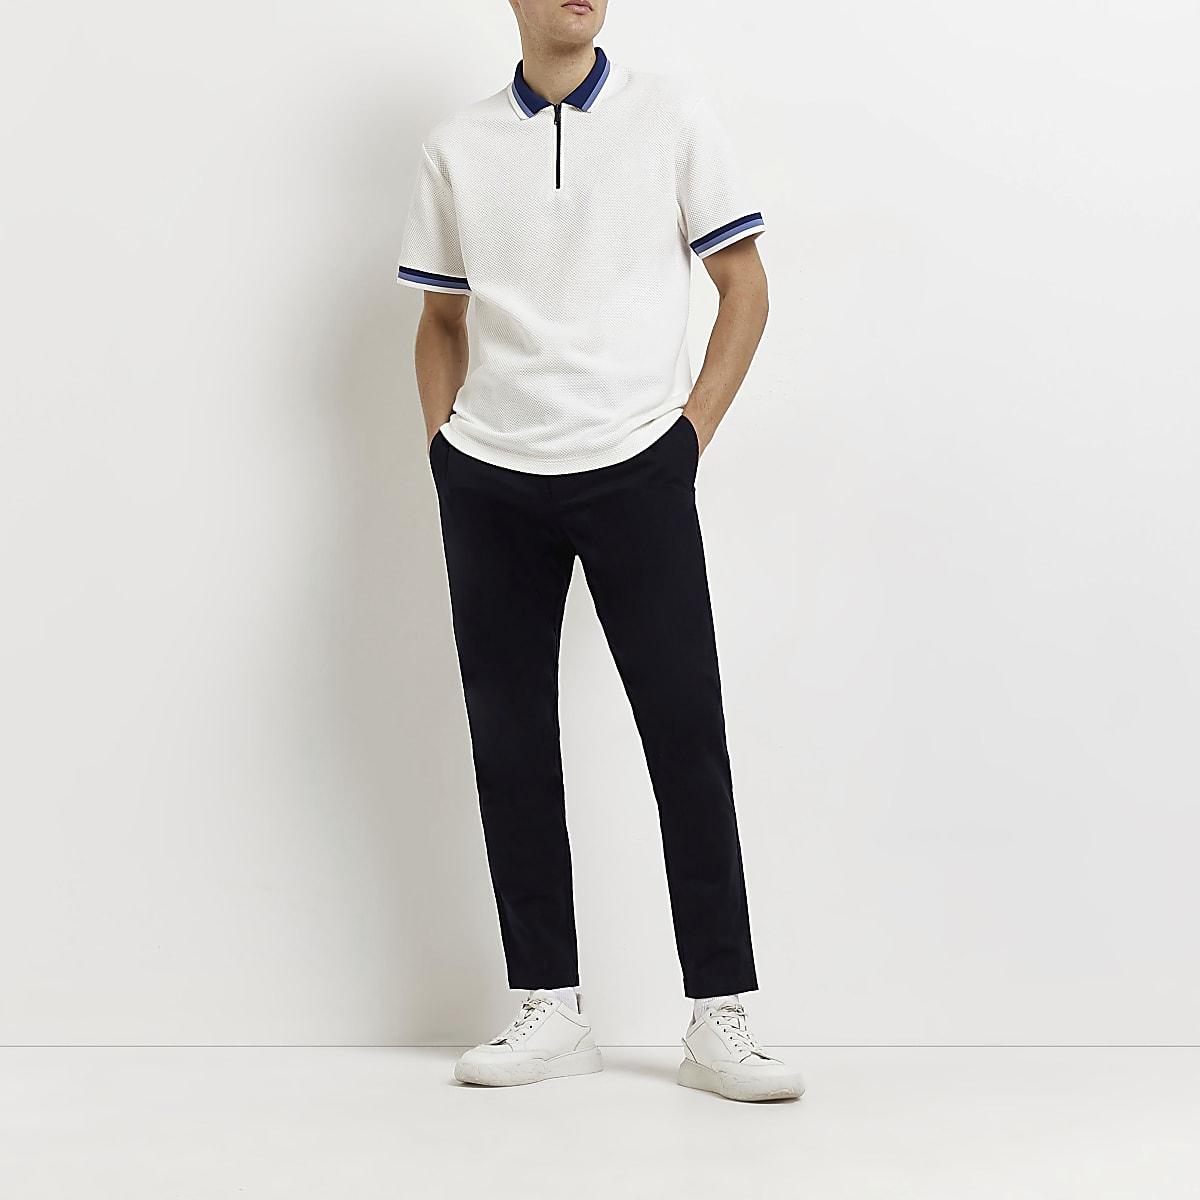 Marineblaue, elegante Skinny Fit Chino-Hose